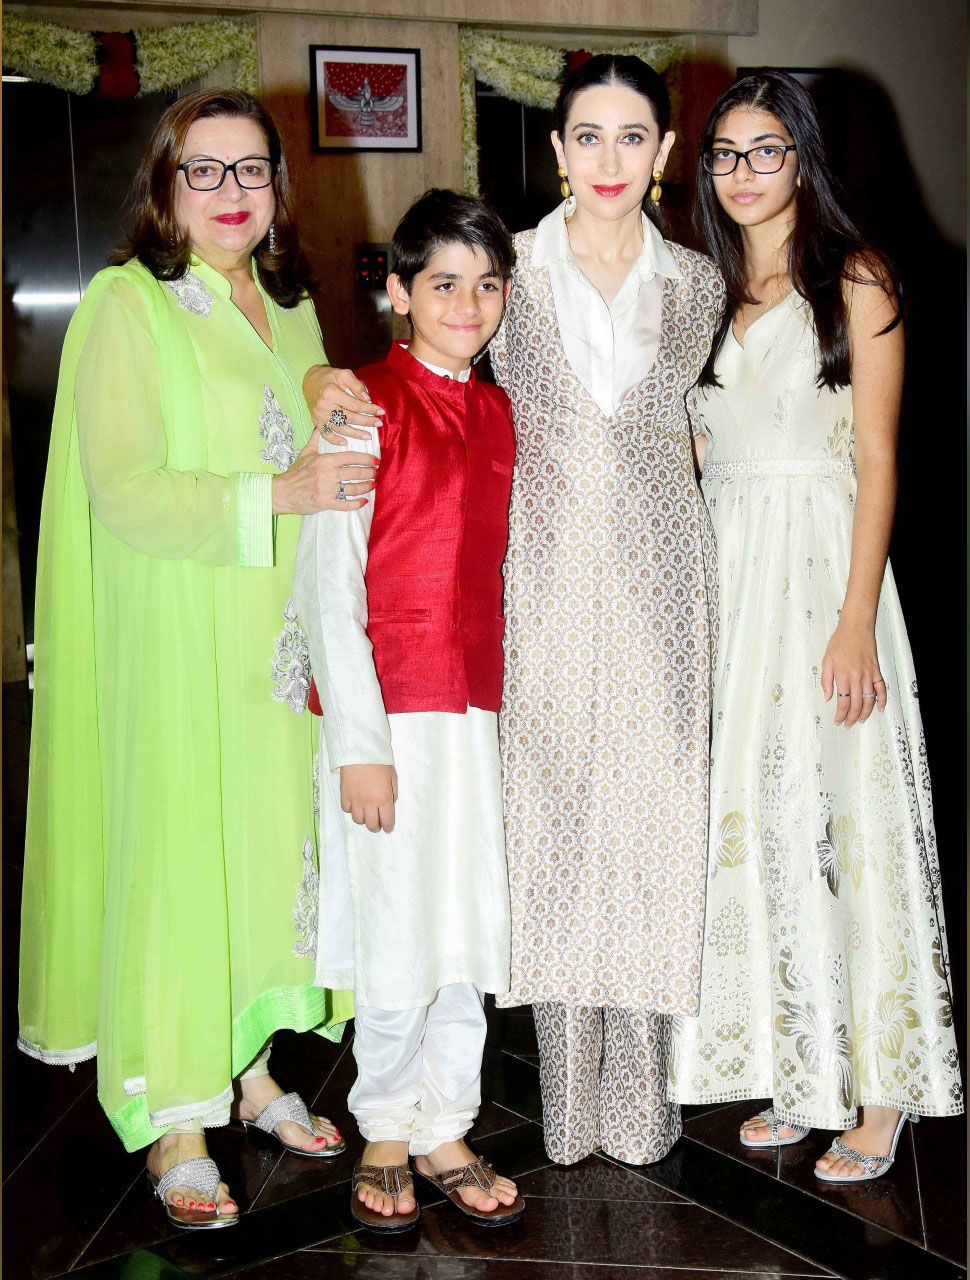 Kareena Kapoor Brother Armaan Jain Roka Ceremony Photos